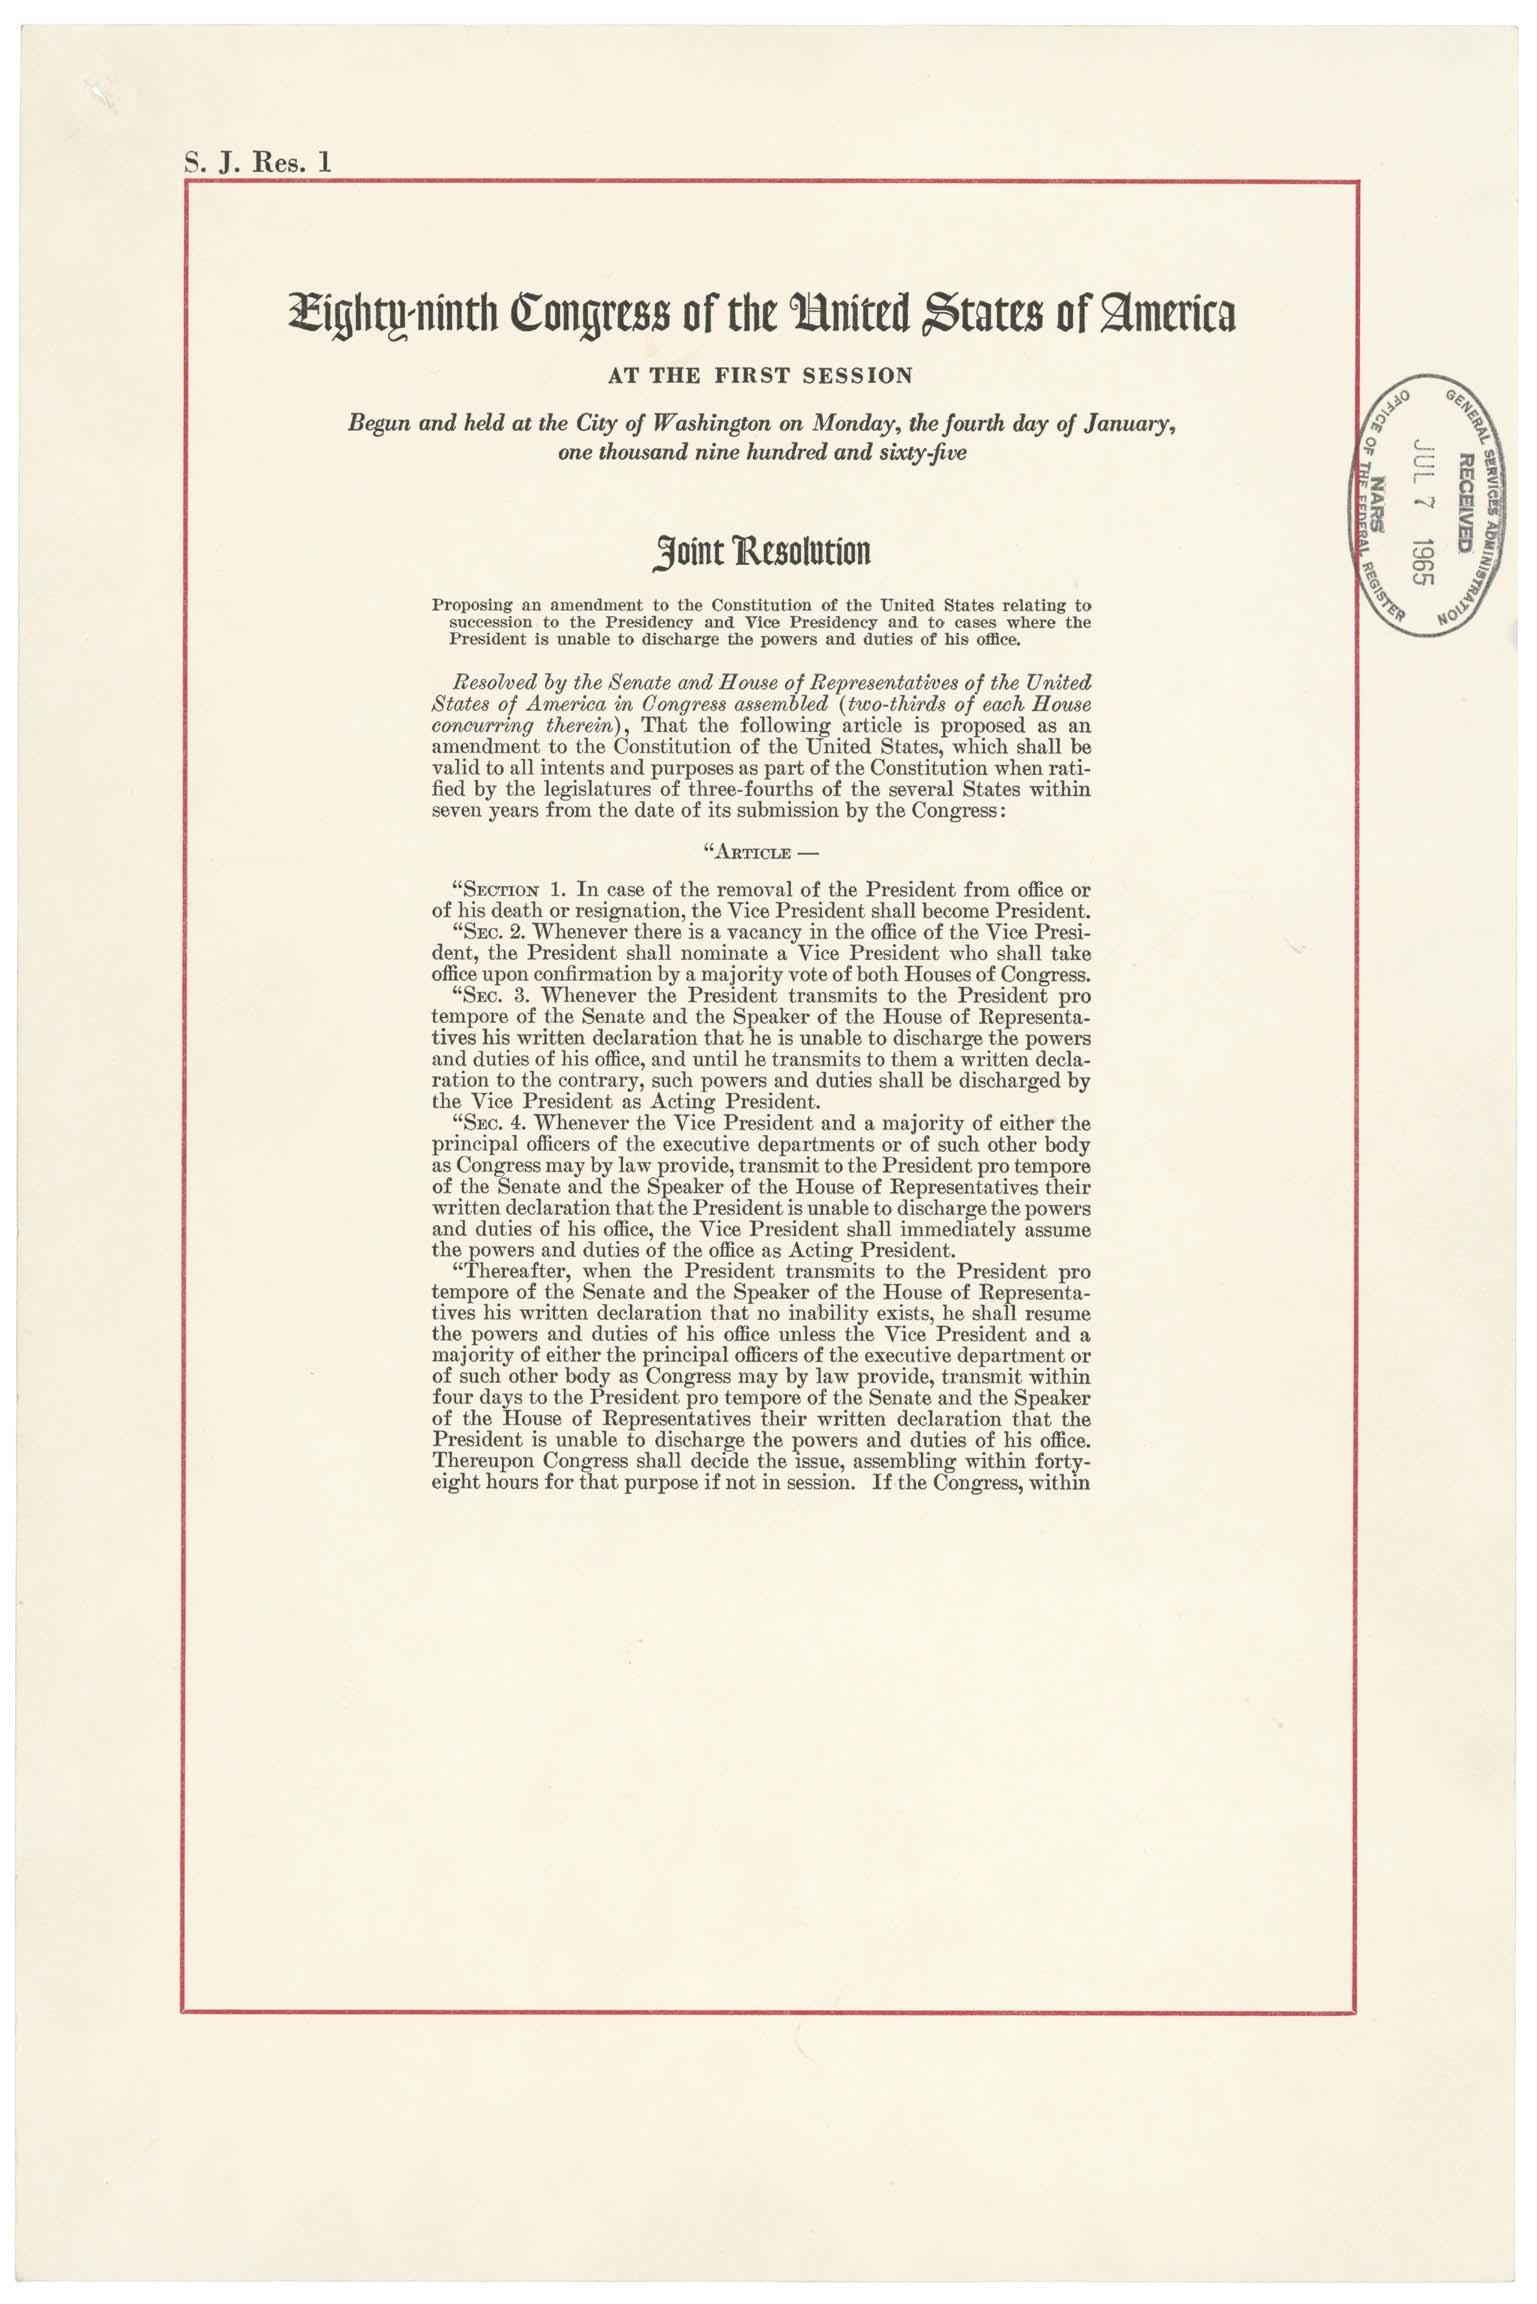 25th_Amendment_Pg1of2_AC.jpg